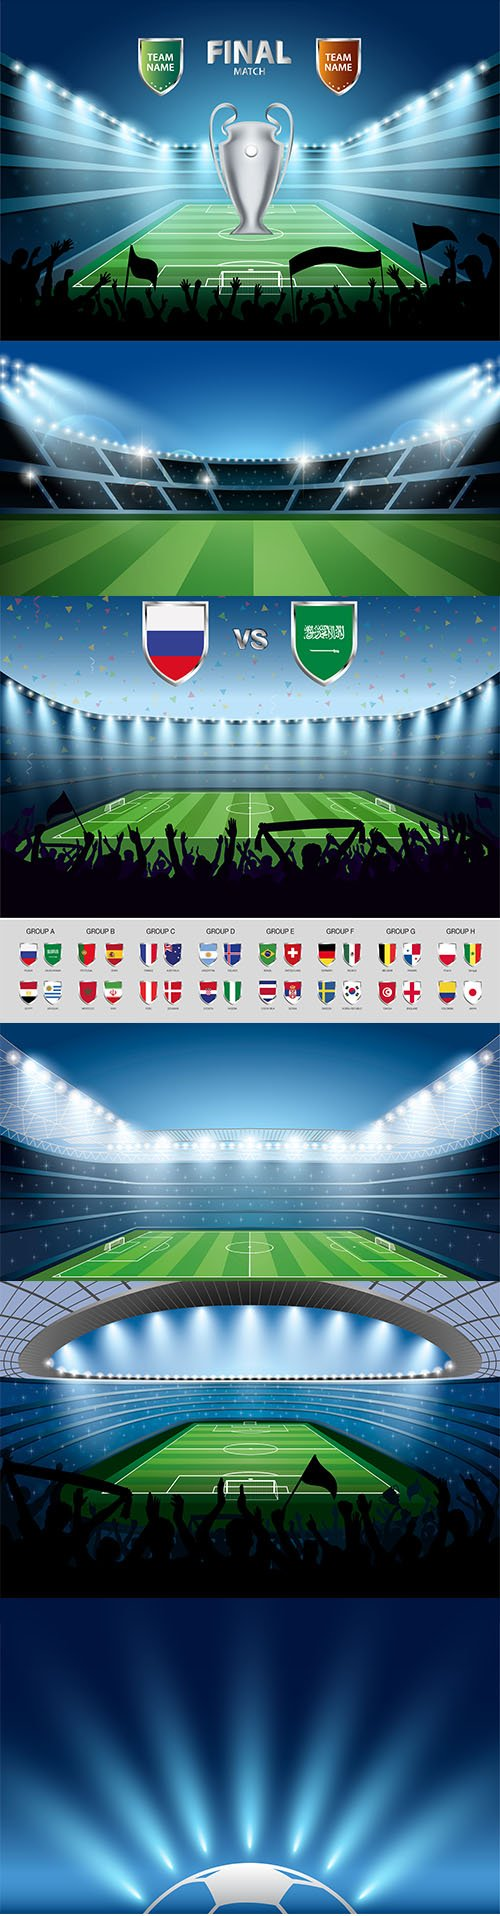 Set of Soccer Stadium Illustrations